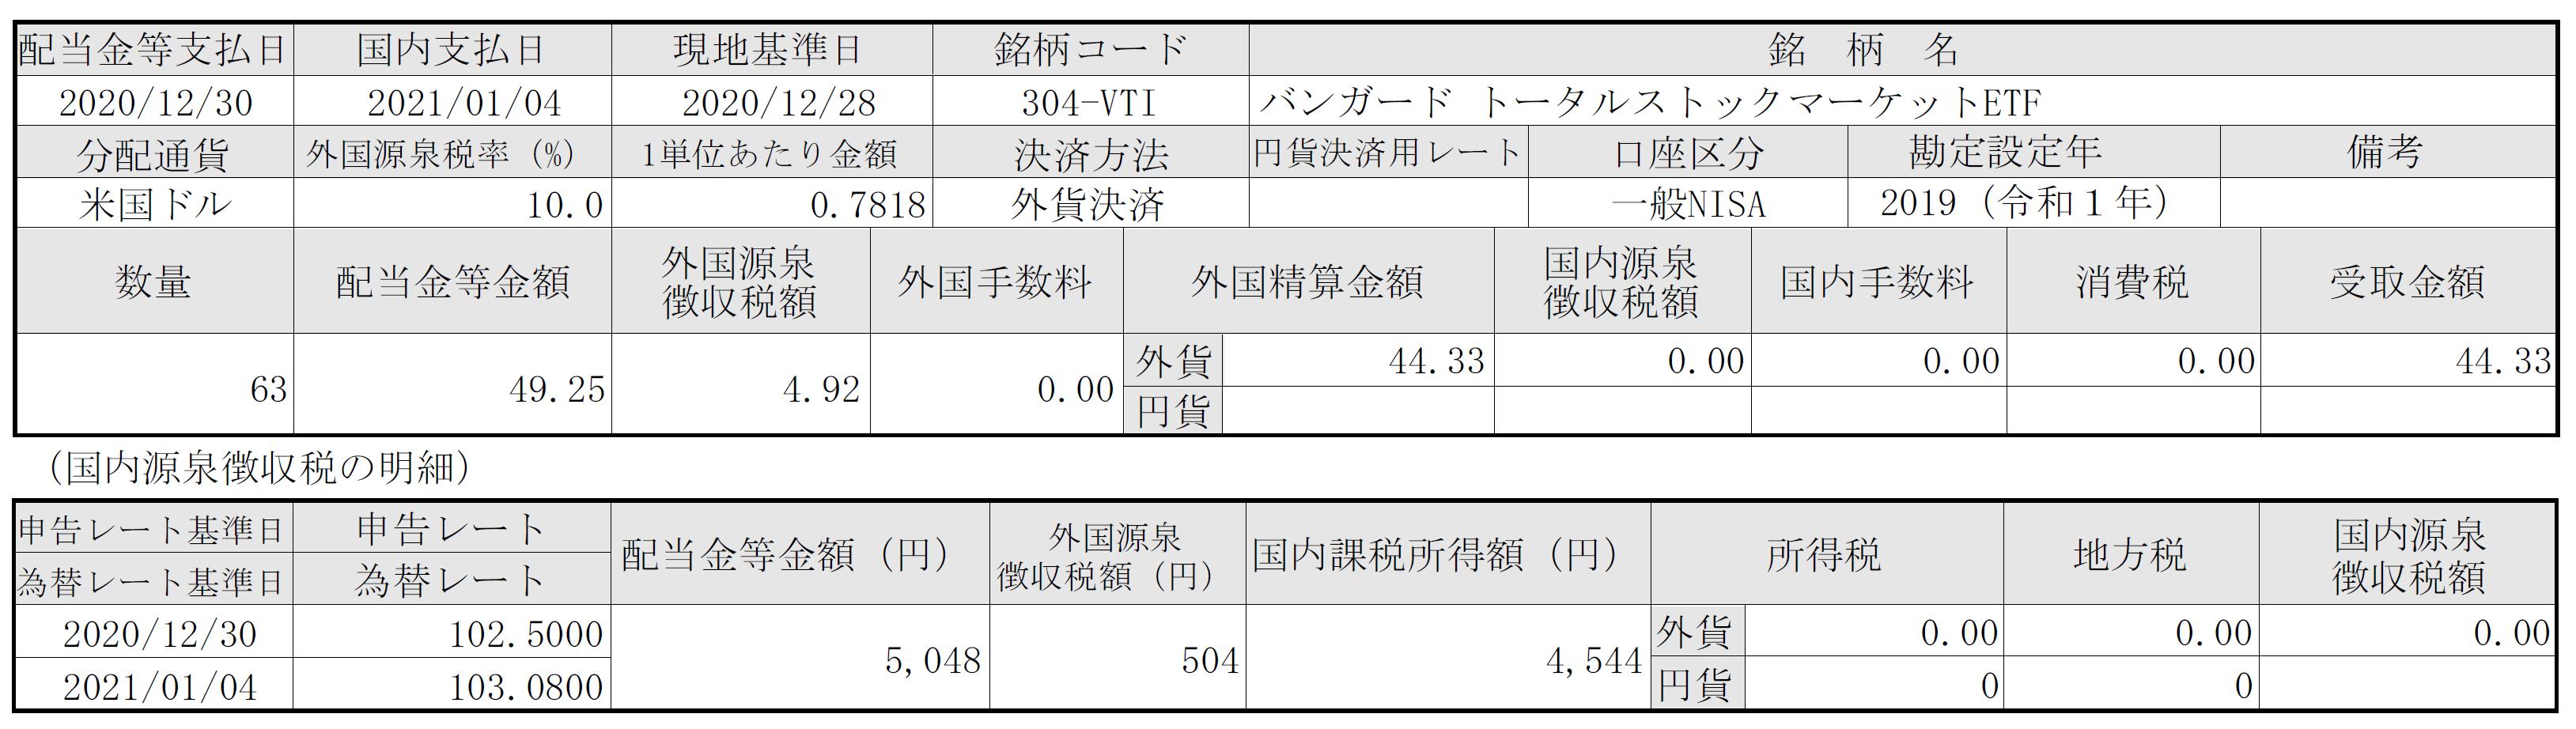 f:id:hodo-work:20210112111020p:plain